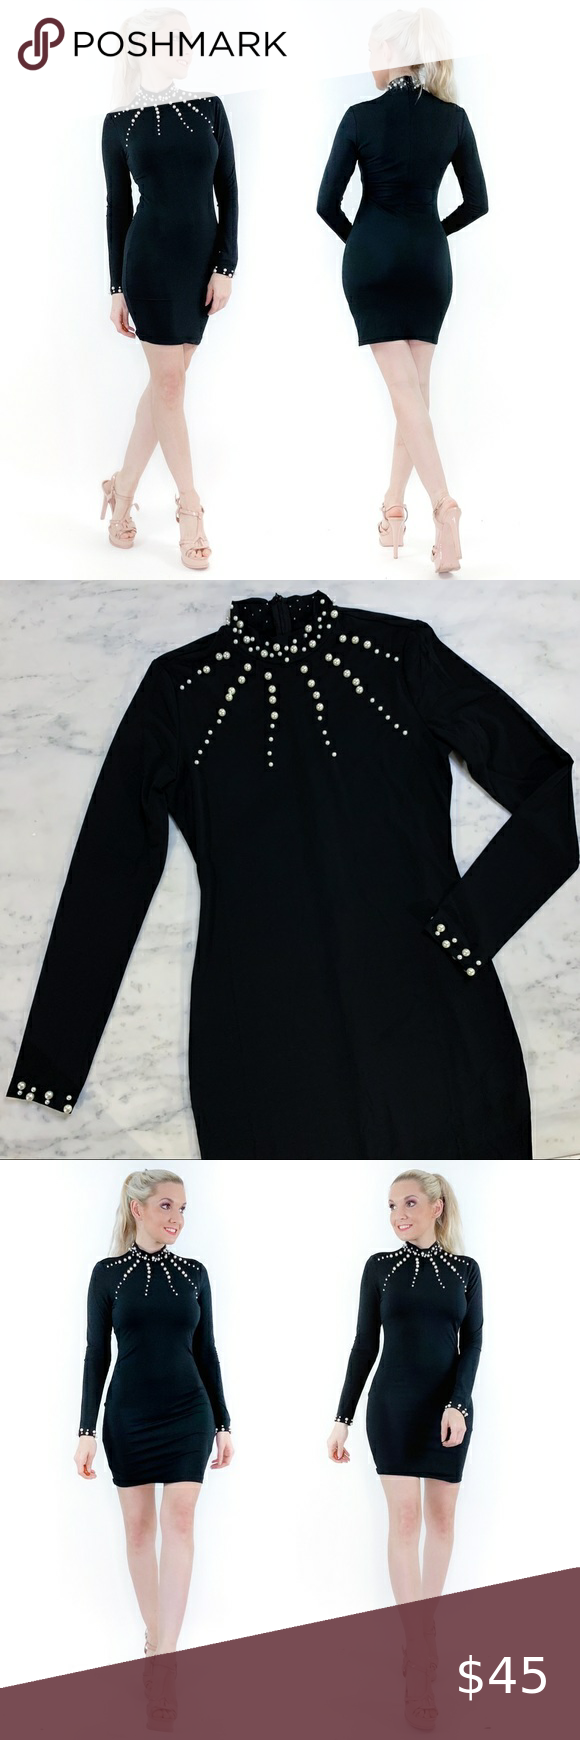 Classy Black Dress With Pearls Black Dresses Classy Bodycon Fashion Flair Dress [ 1740 x 580 Pixel ]